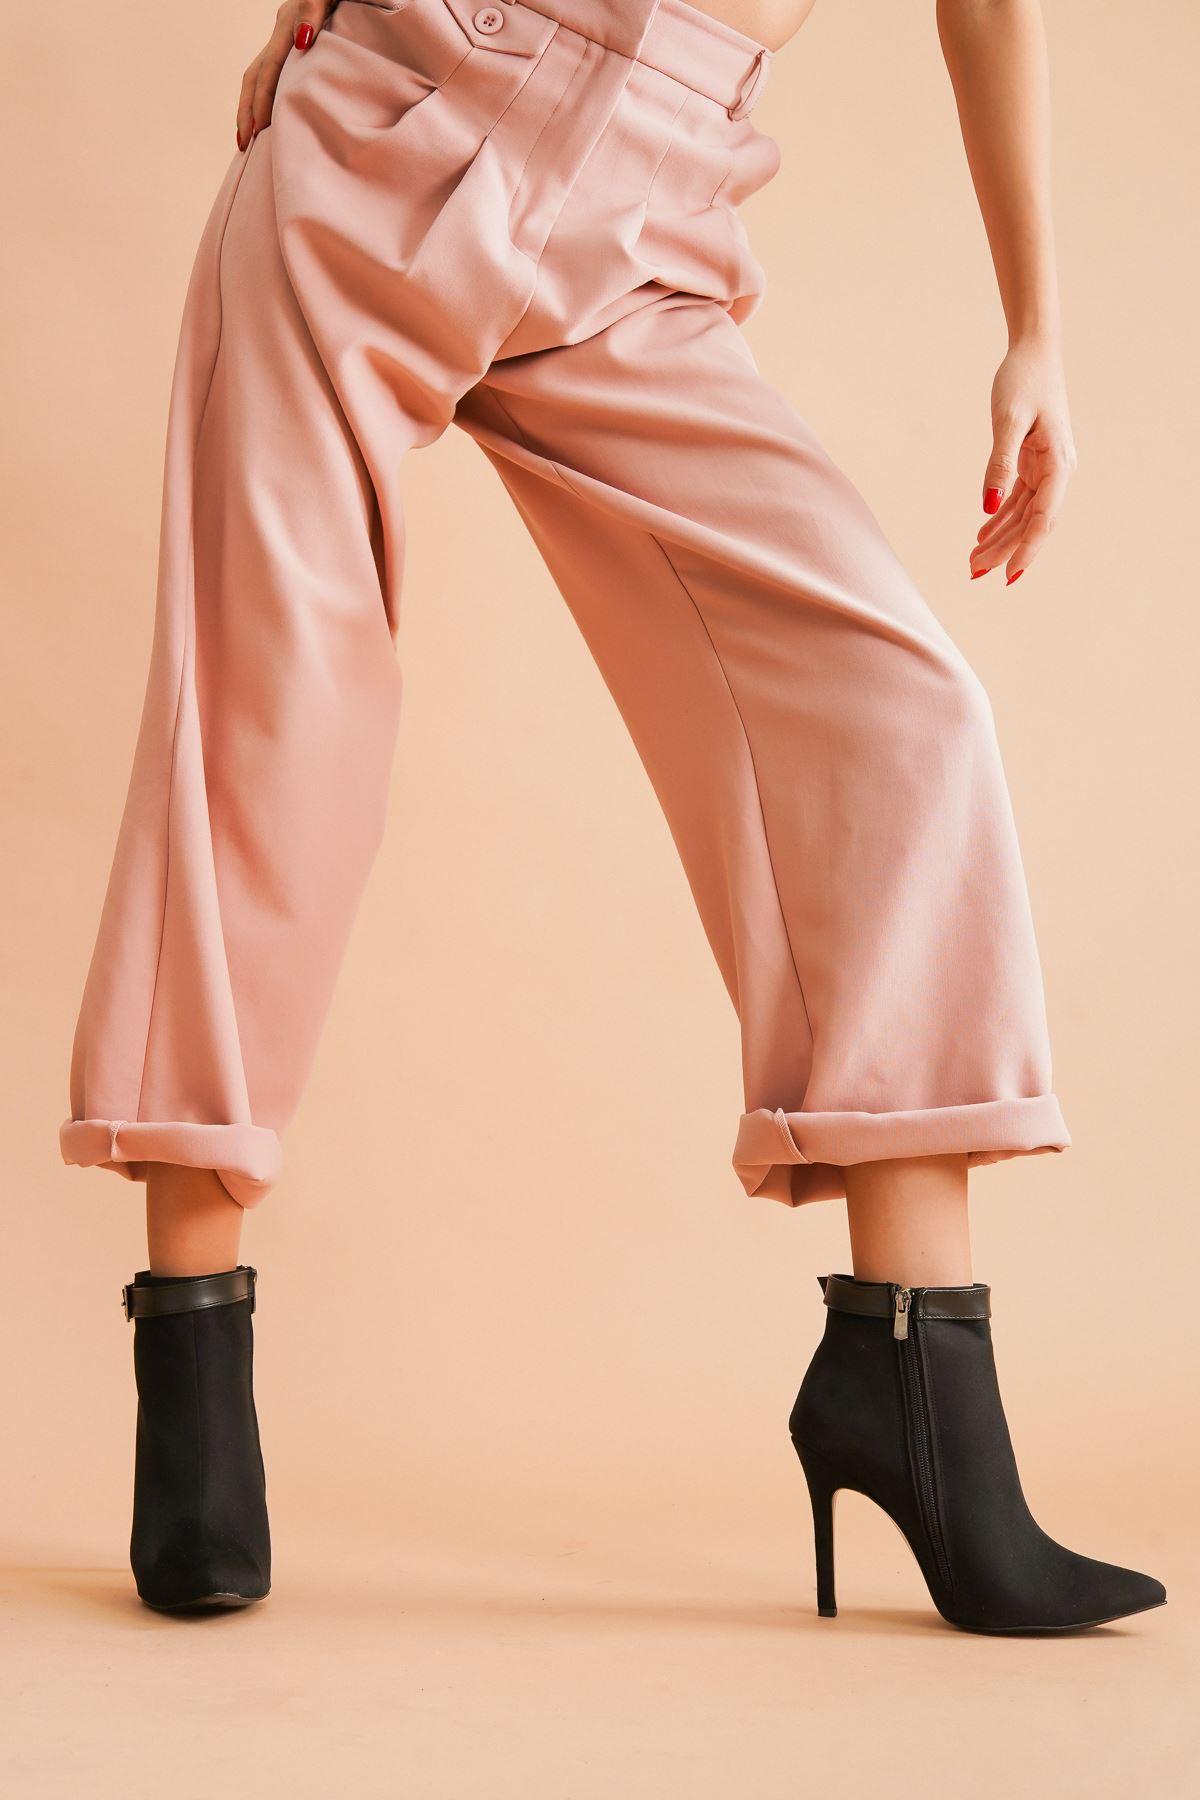 Ventos Siyah Süet Topuklu Stiletto Kadın Bot